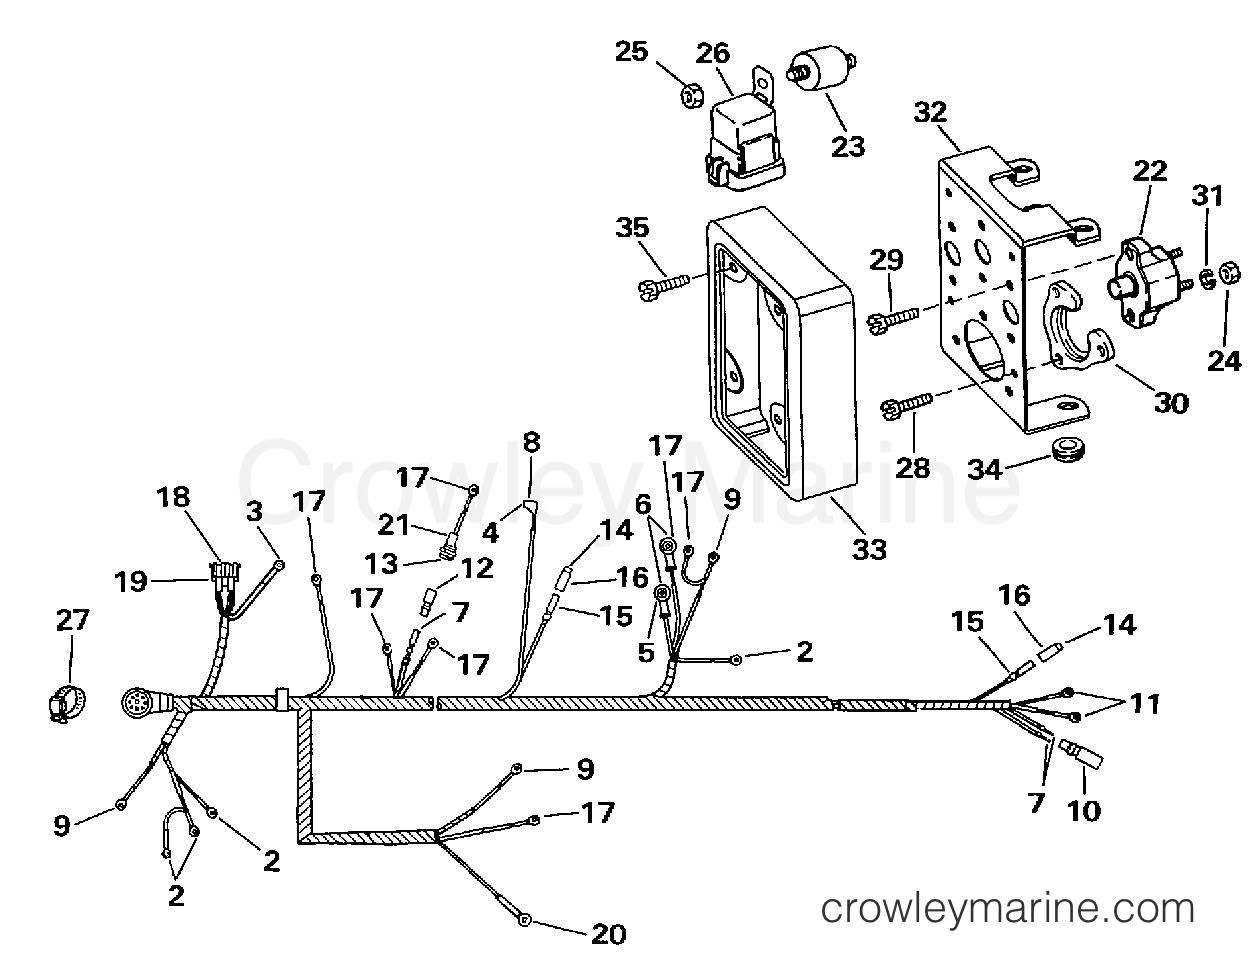 hight resolution of 1997 omc stern drive 5 7 572bplkd engine wire harness bracket 2v models